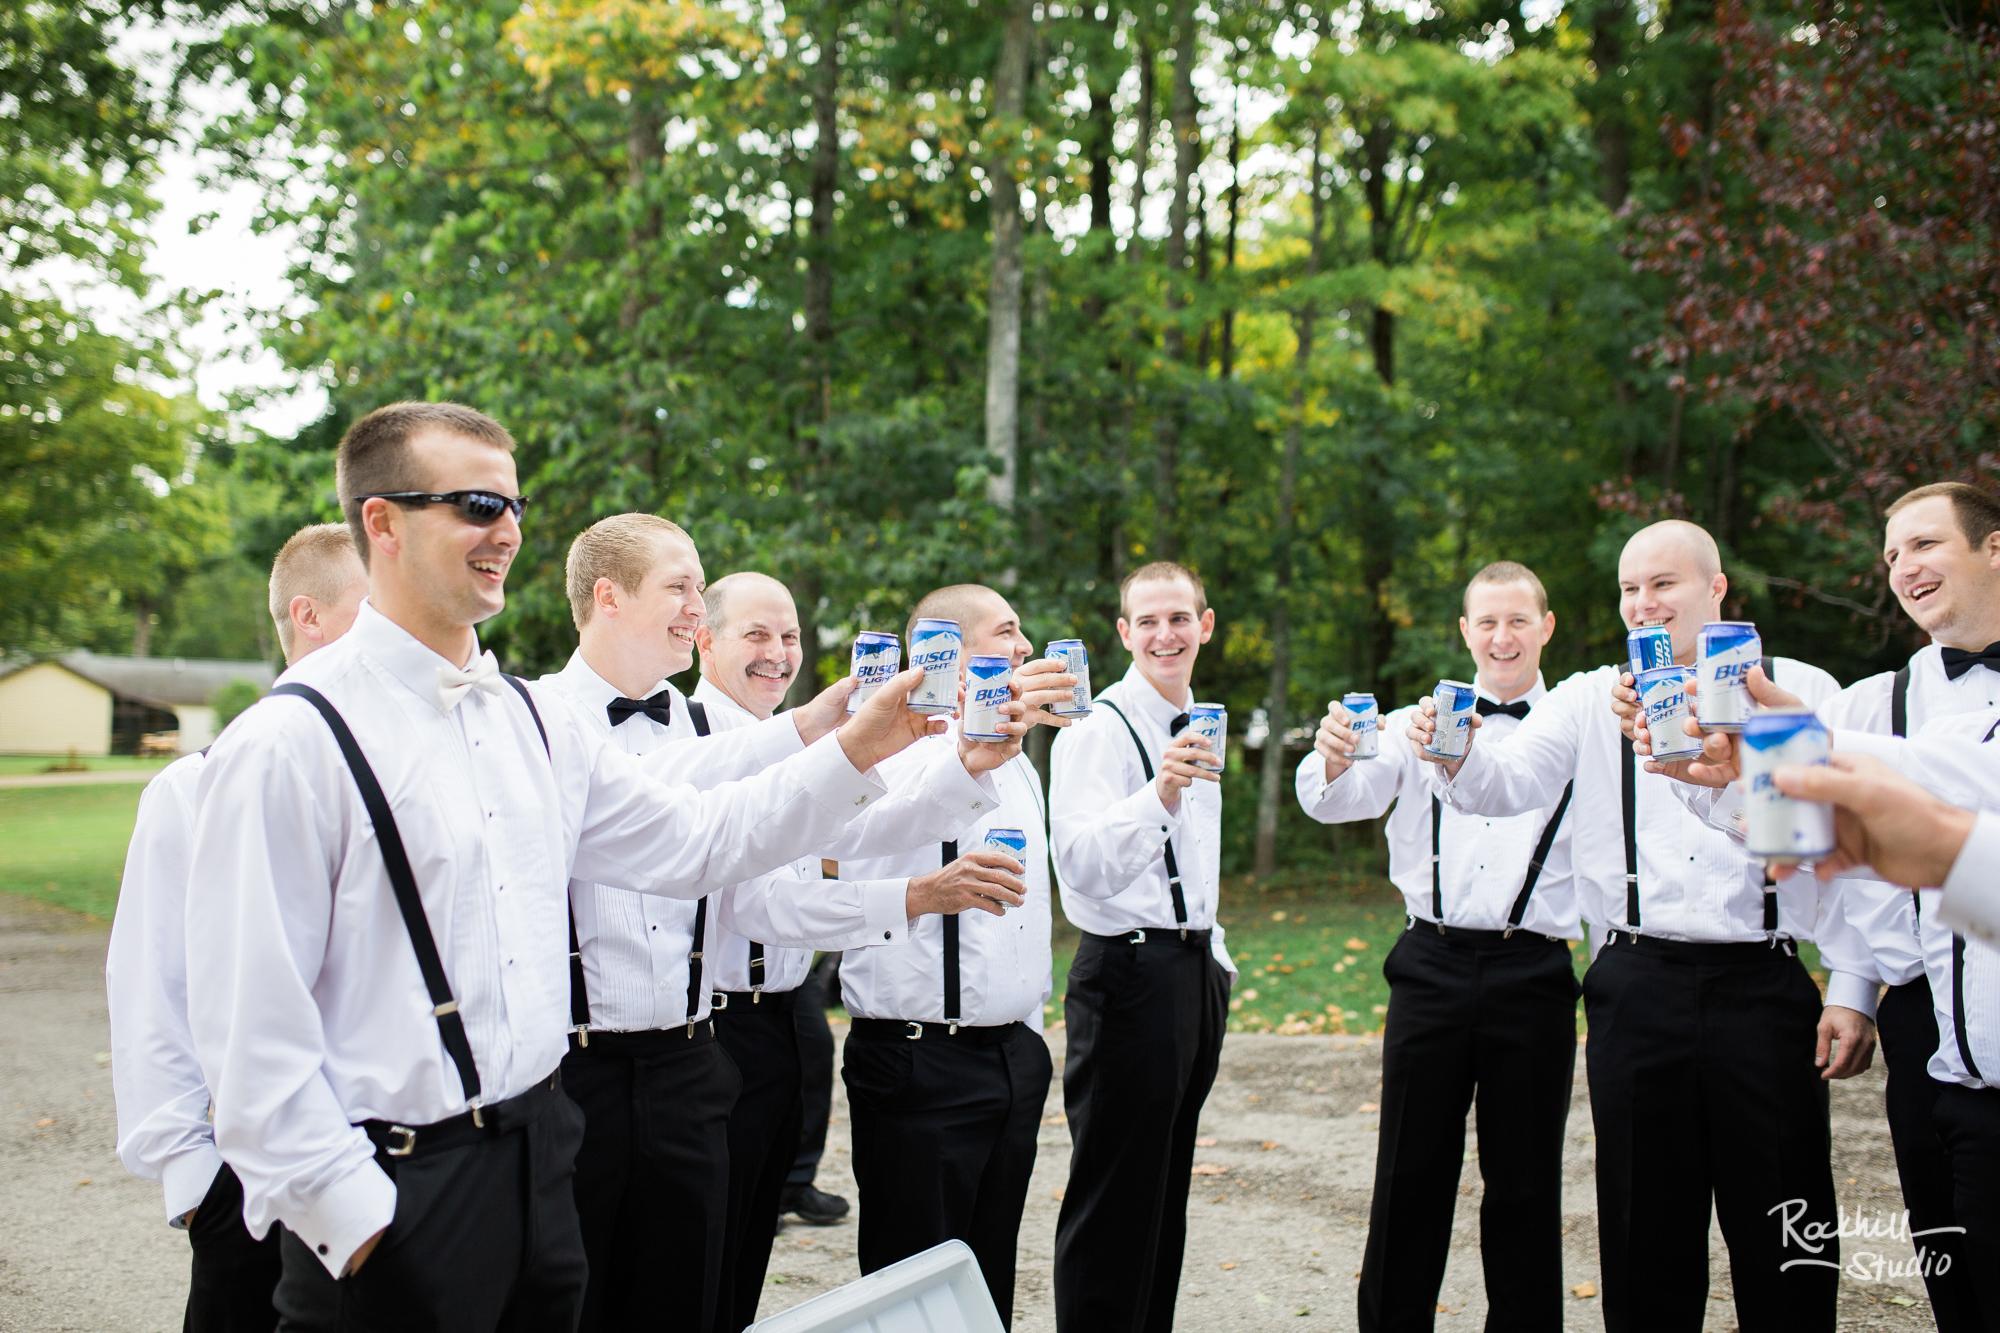 rockhill-studio-michigan-wedding-upper-peninsula-large-groomsen-party-candid-jpg